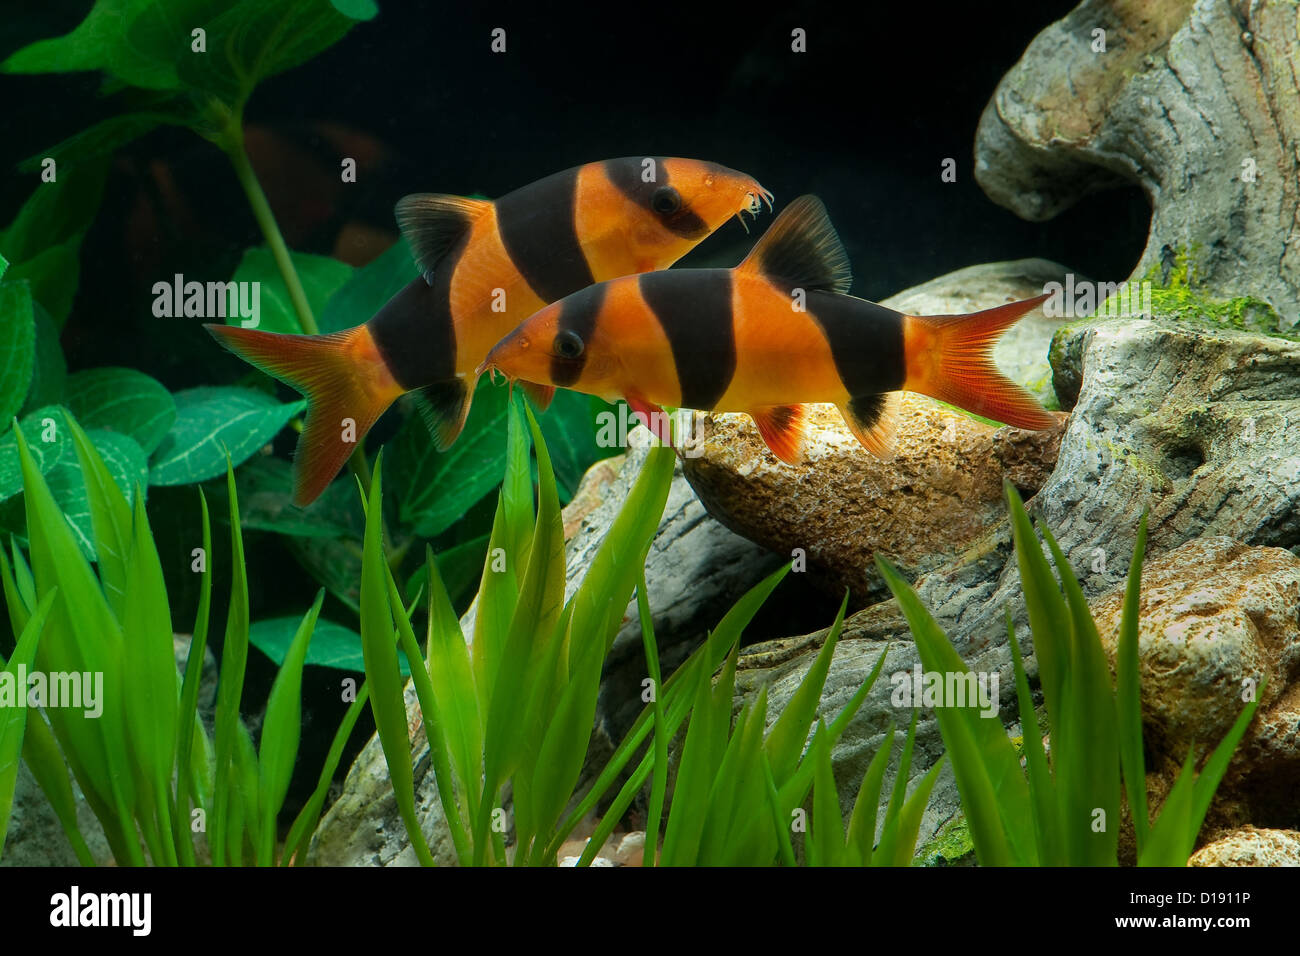 Freshwater aquarium fish loach - Stock Photo Two Beautiful Clown Loach Aquarium Fish